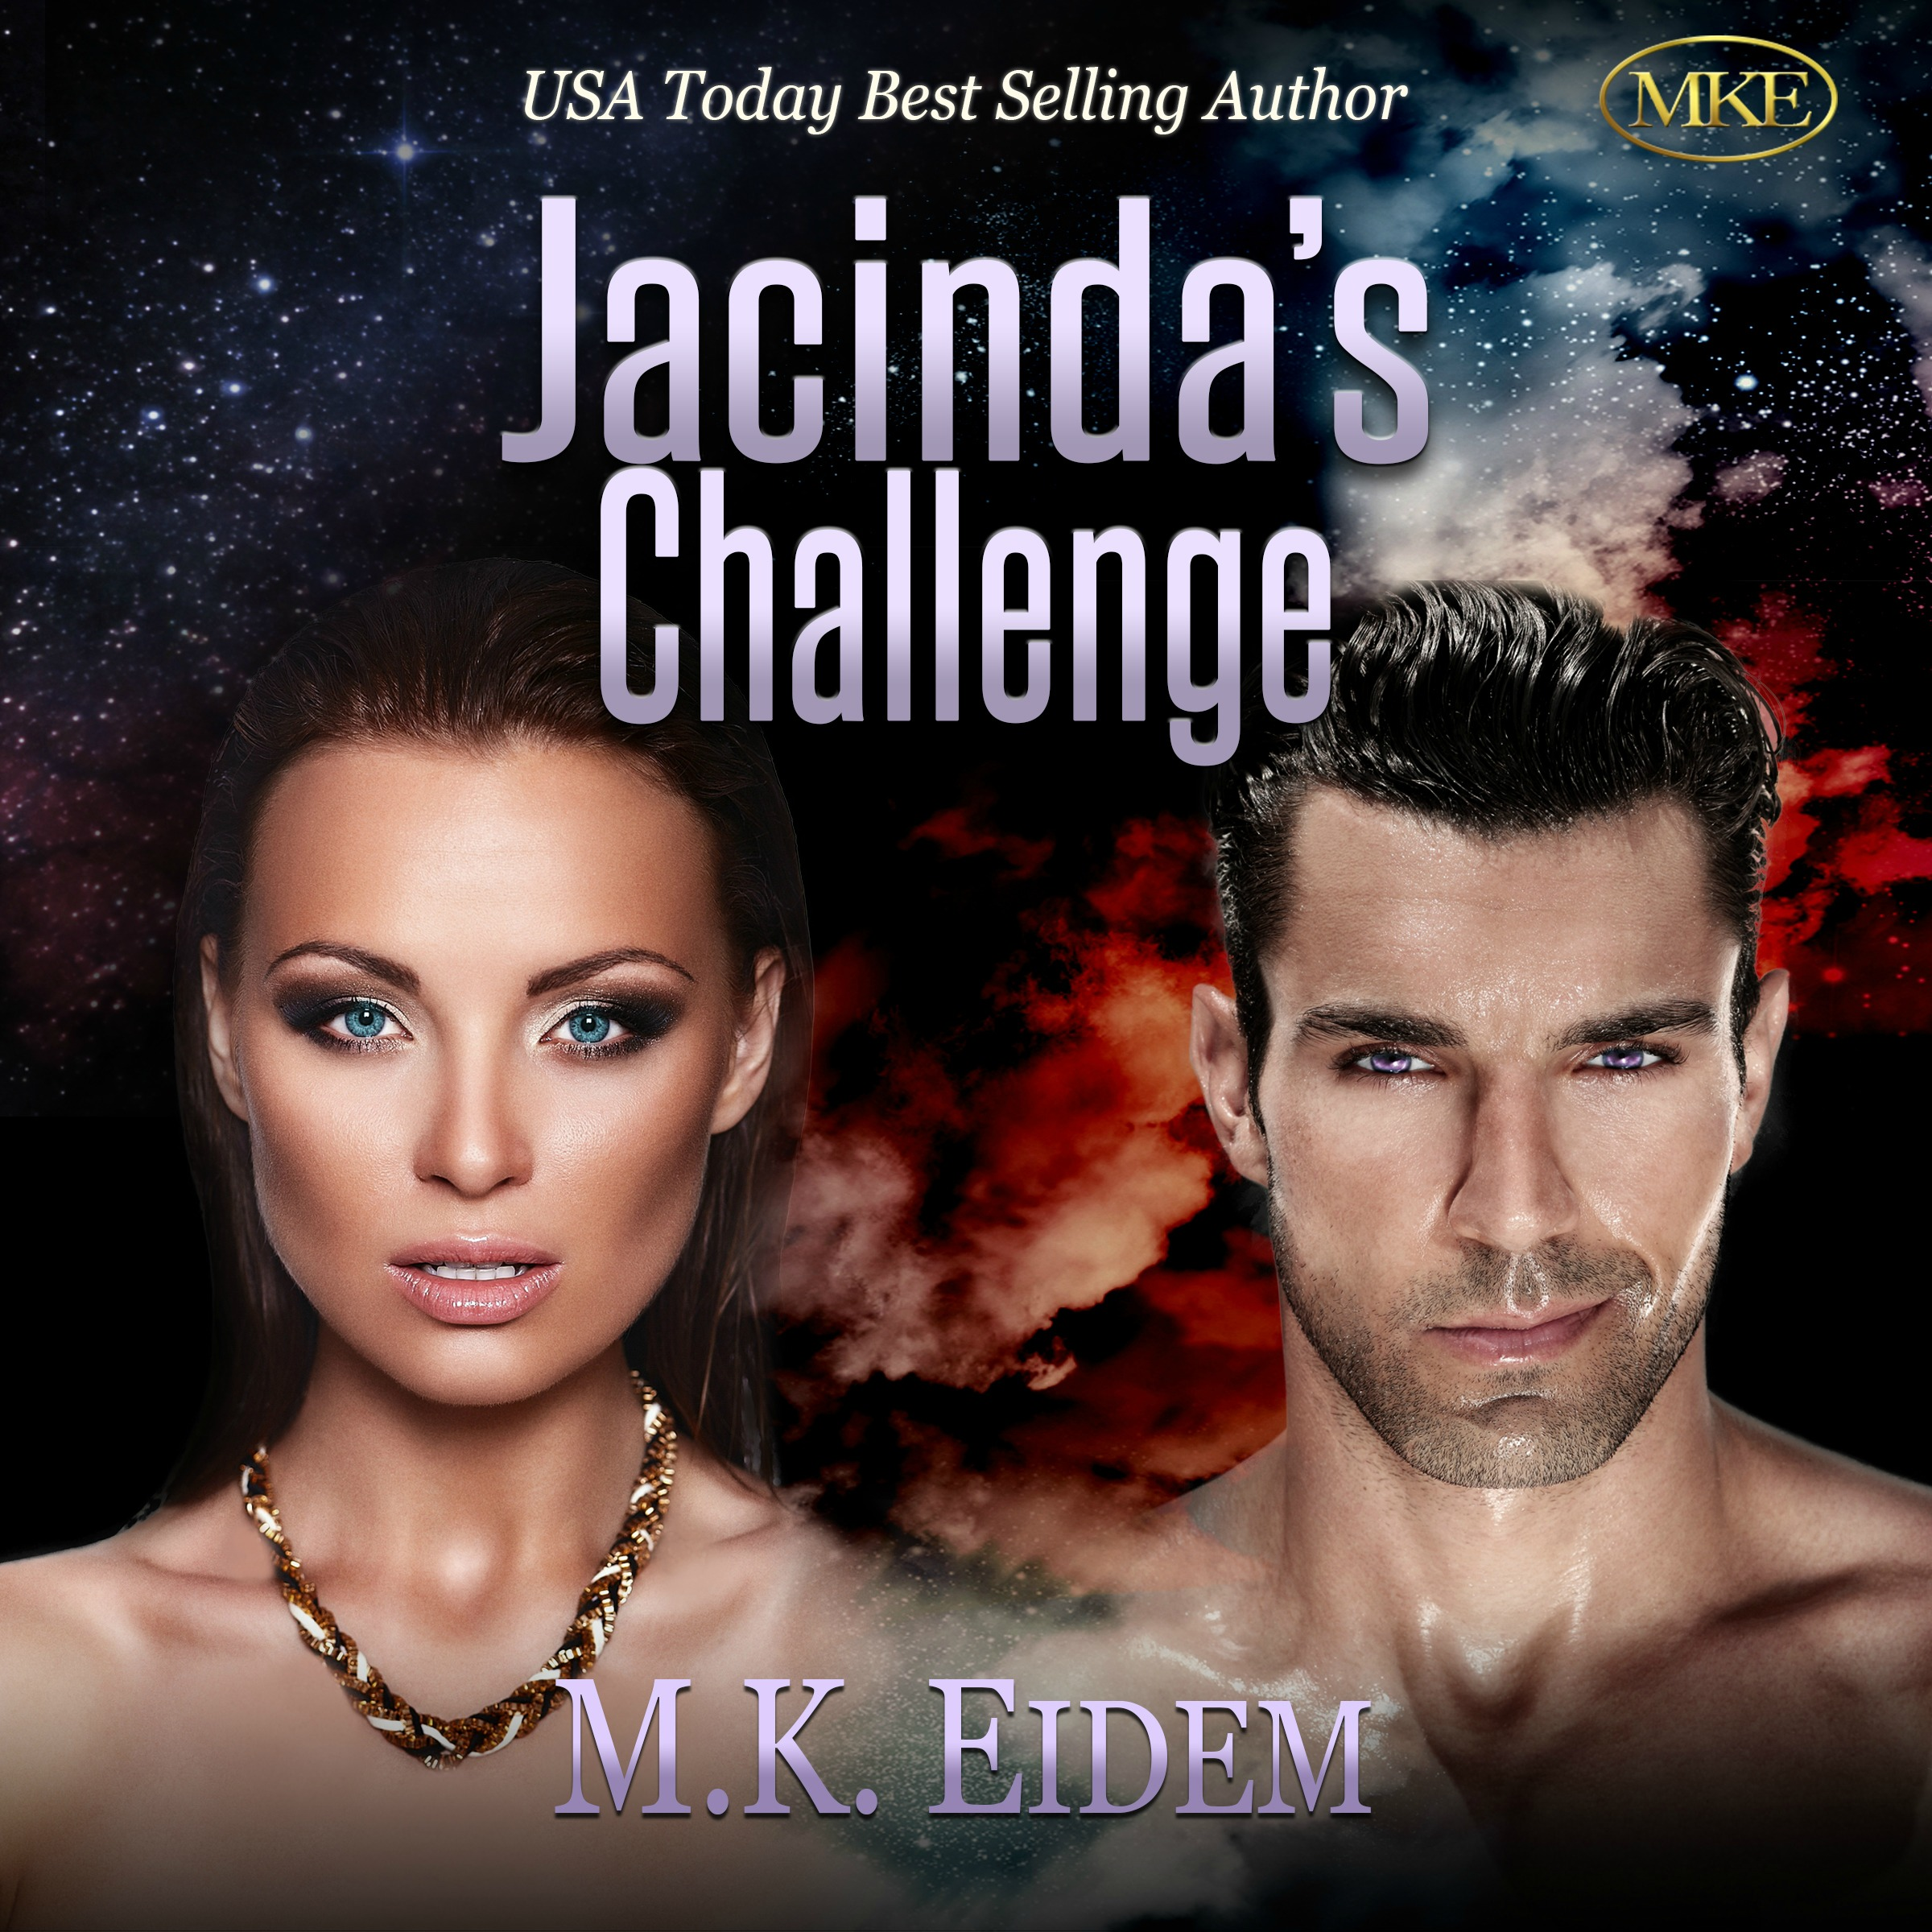 Jacinda's Challenge – Audiobook